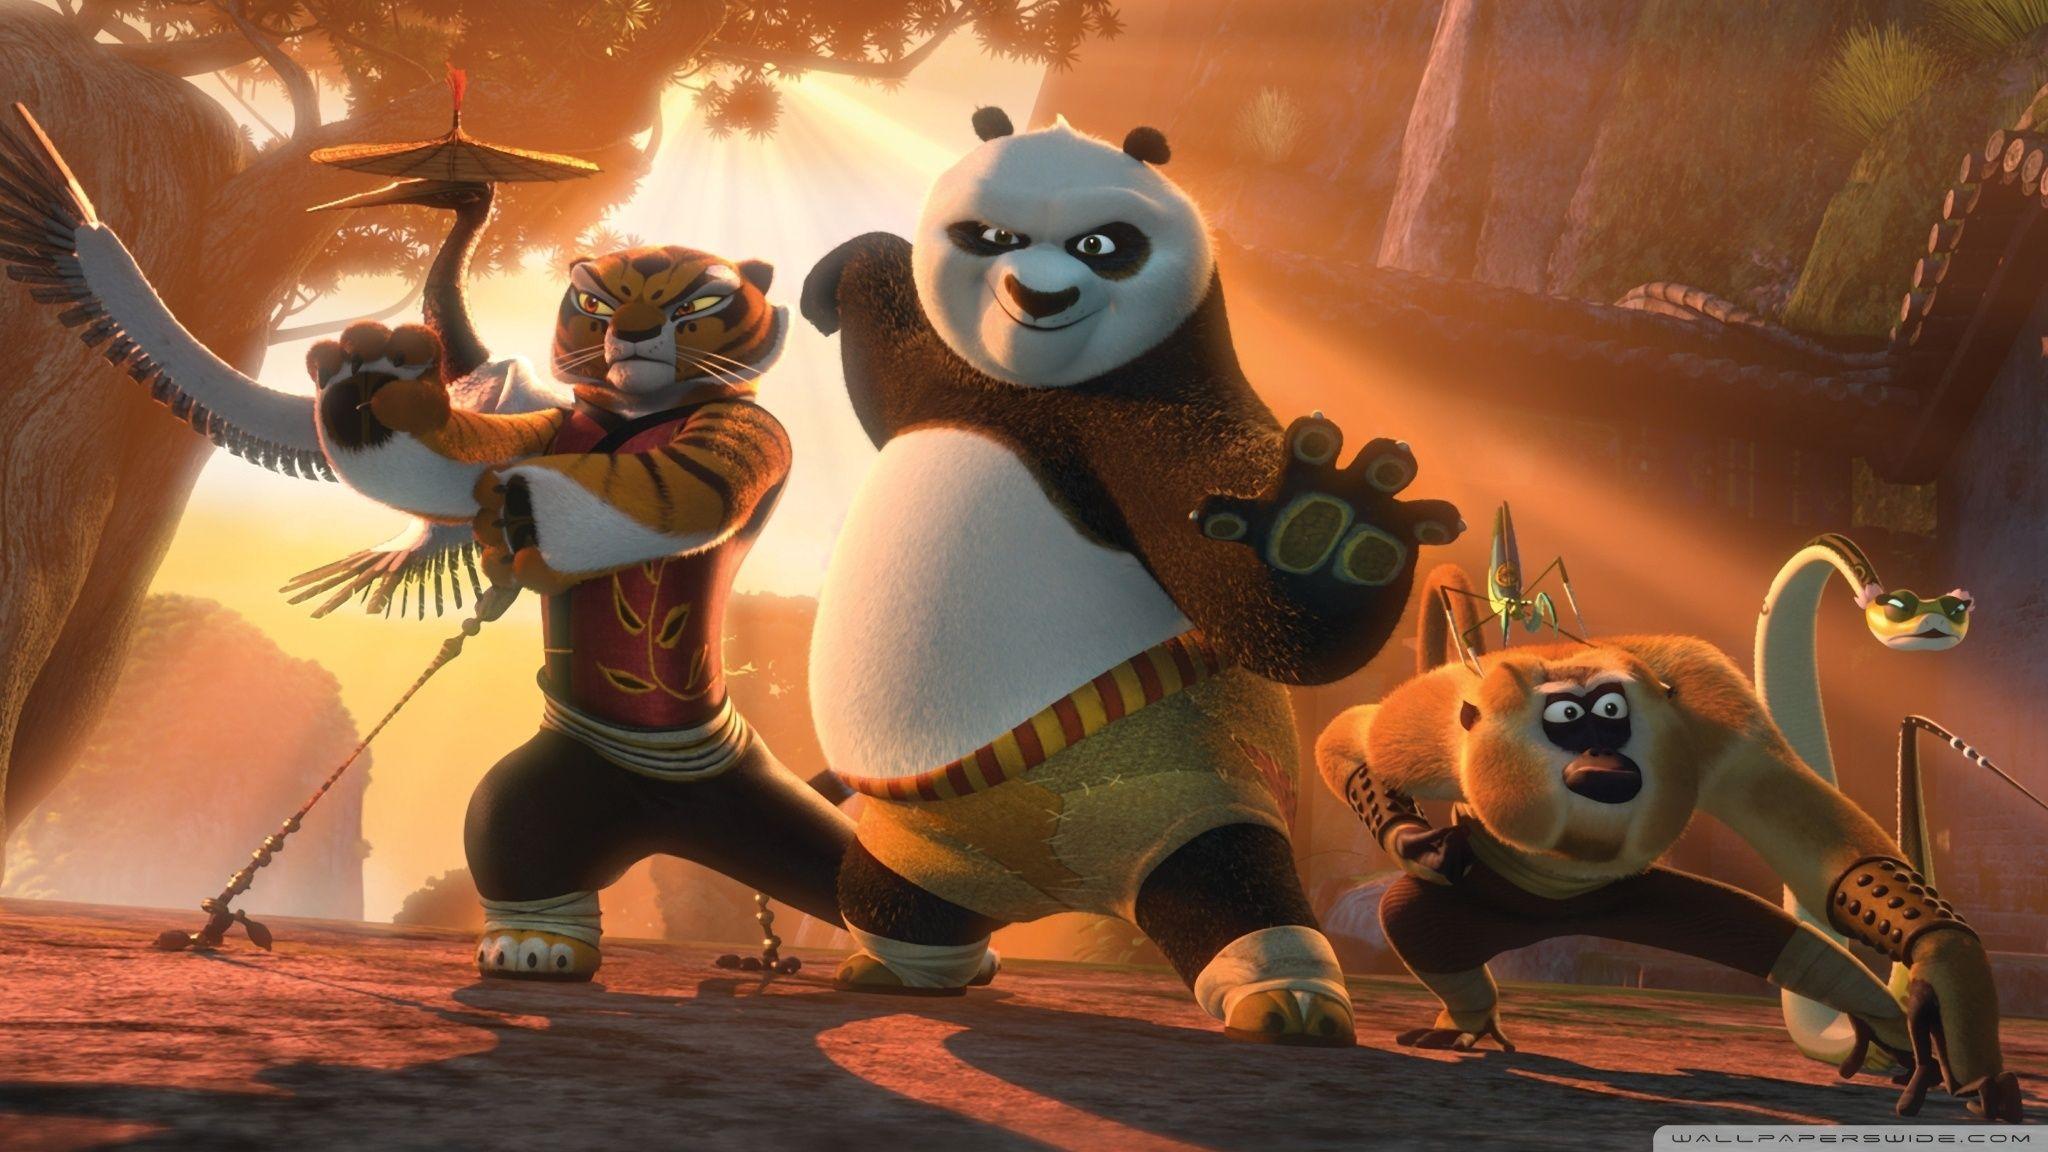 Kung Fu Panda Hd Wallpaper Free Download